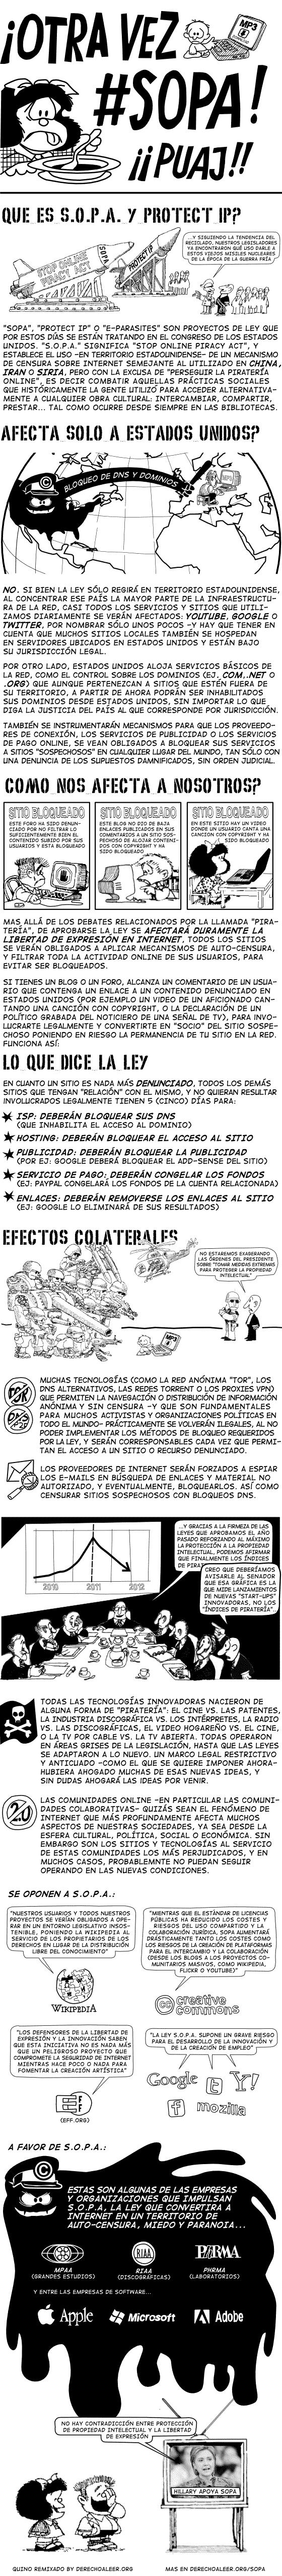 Infografía Otra vez Sopa, Quino